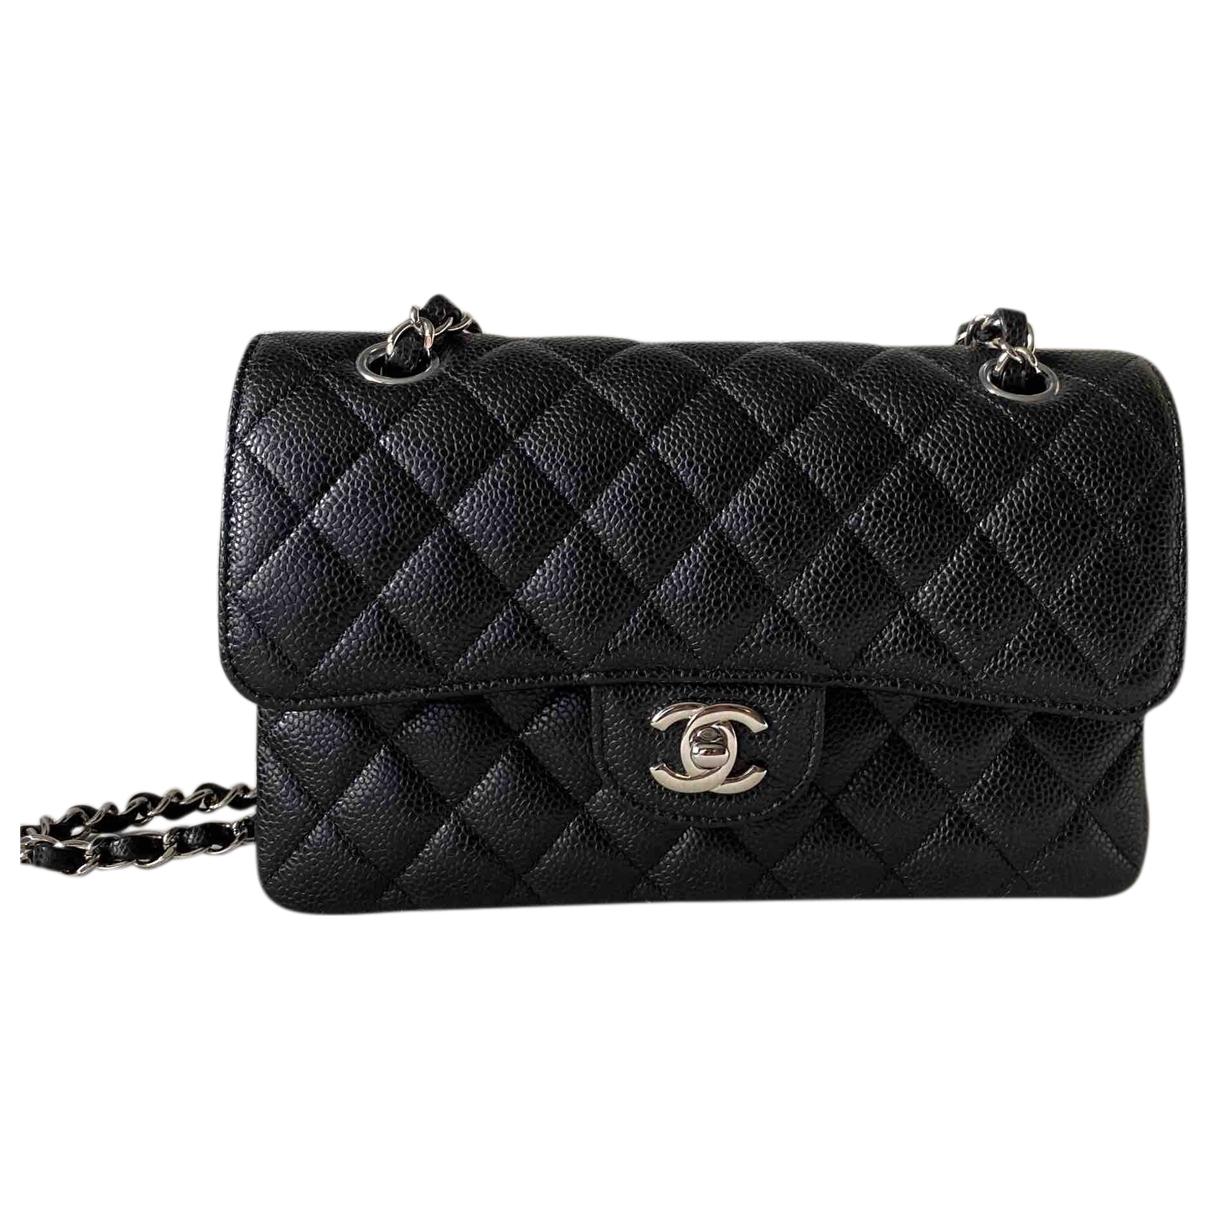 Chanel Timeless/Classique Black Leather handbag for Women \N